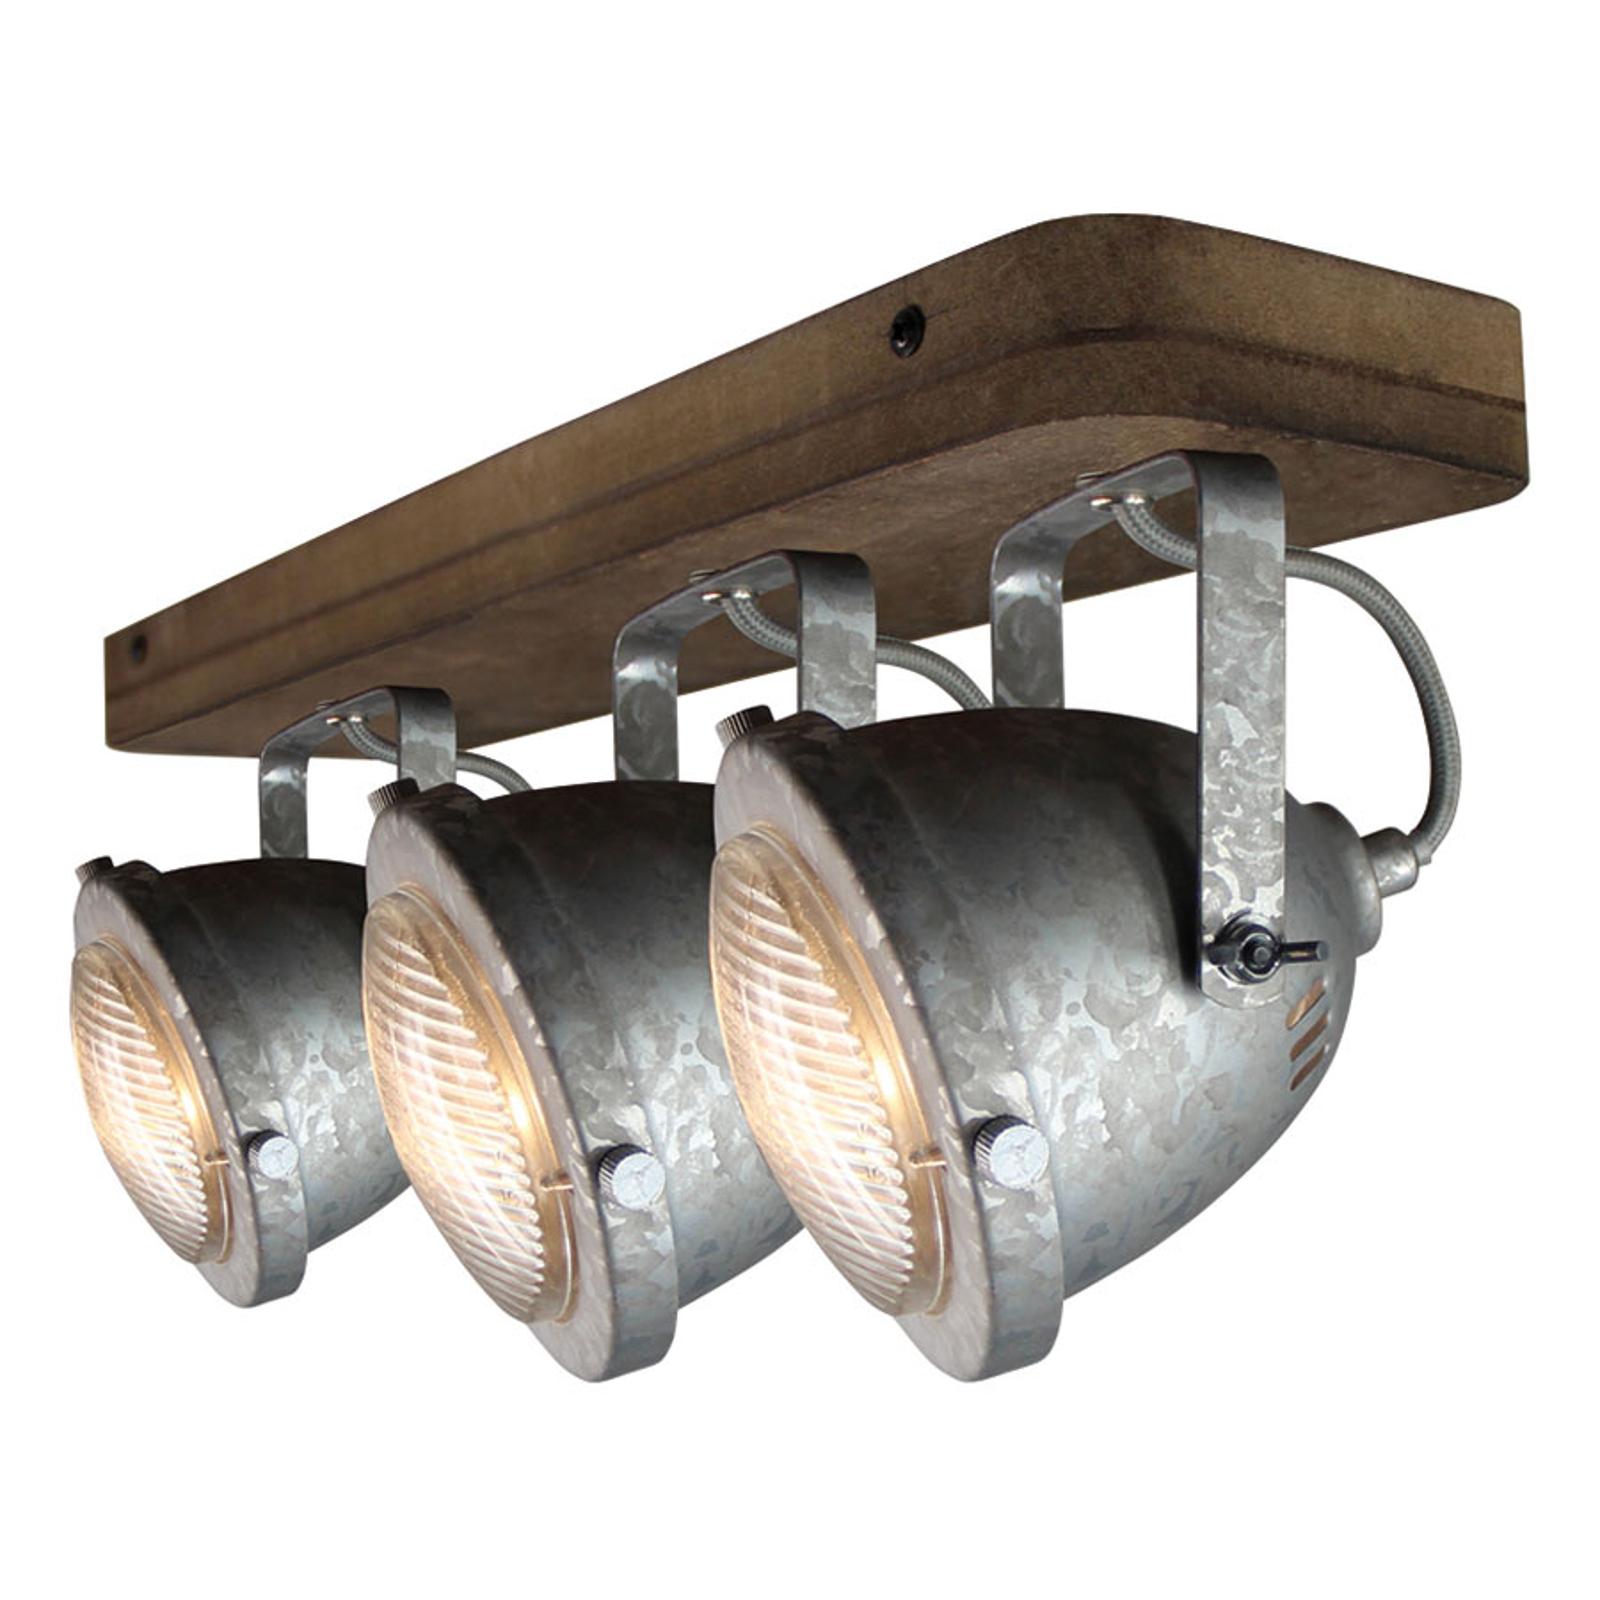 Lampa sufitowa Woody, galwanizowana, 3-punktowa